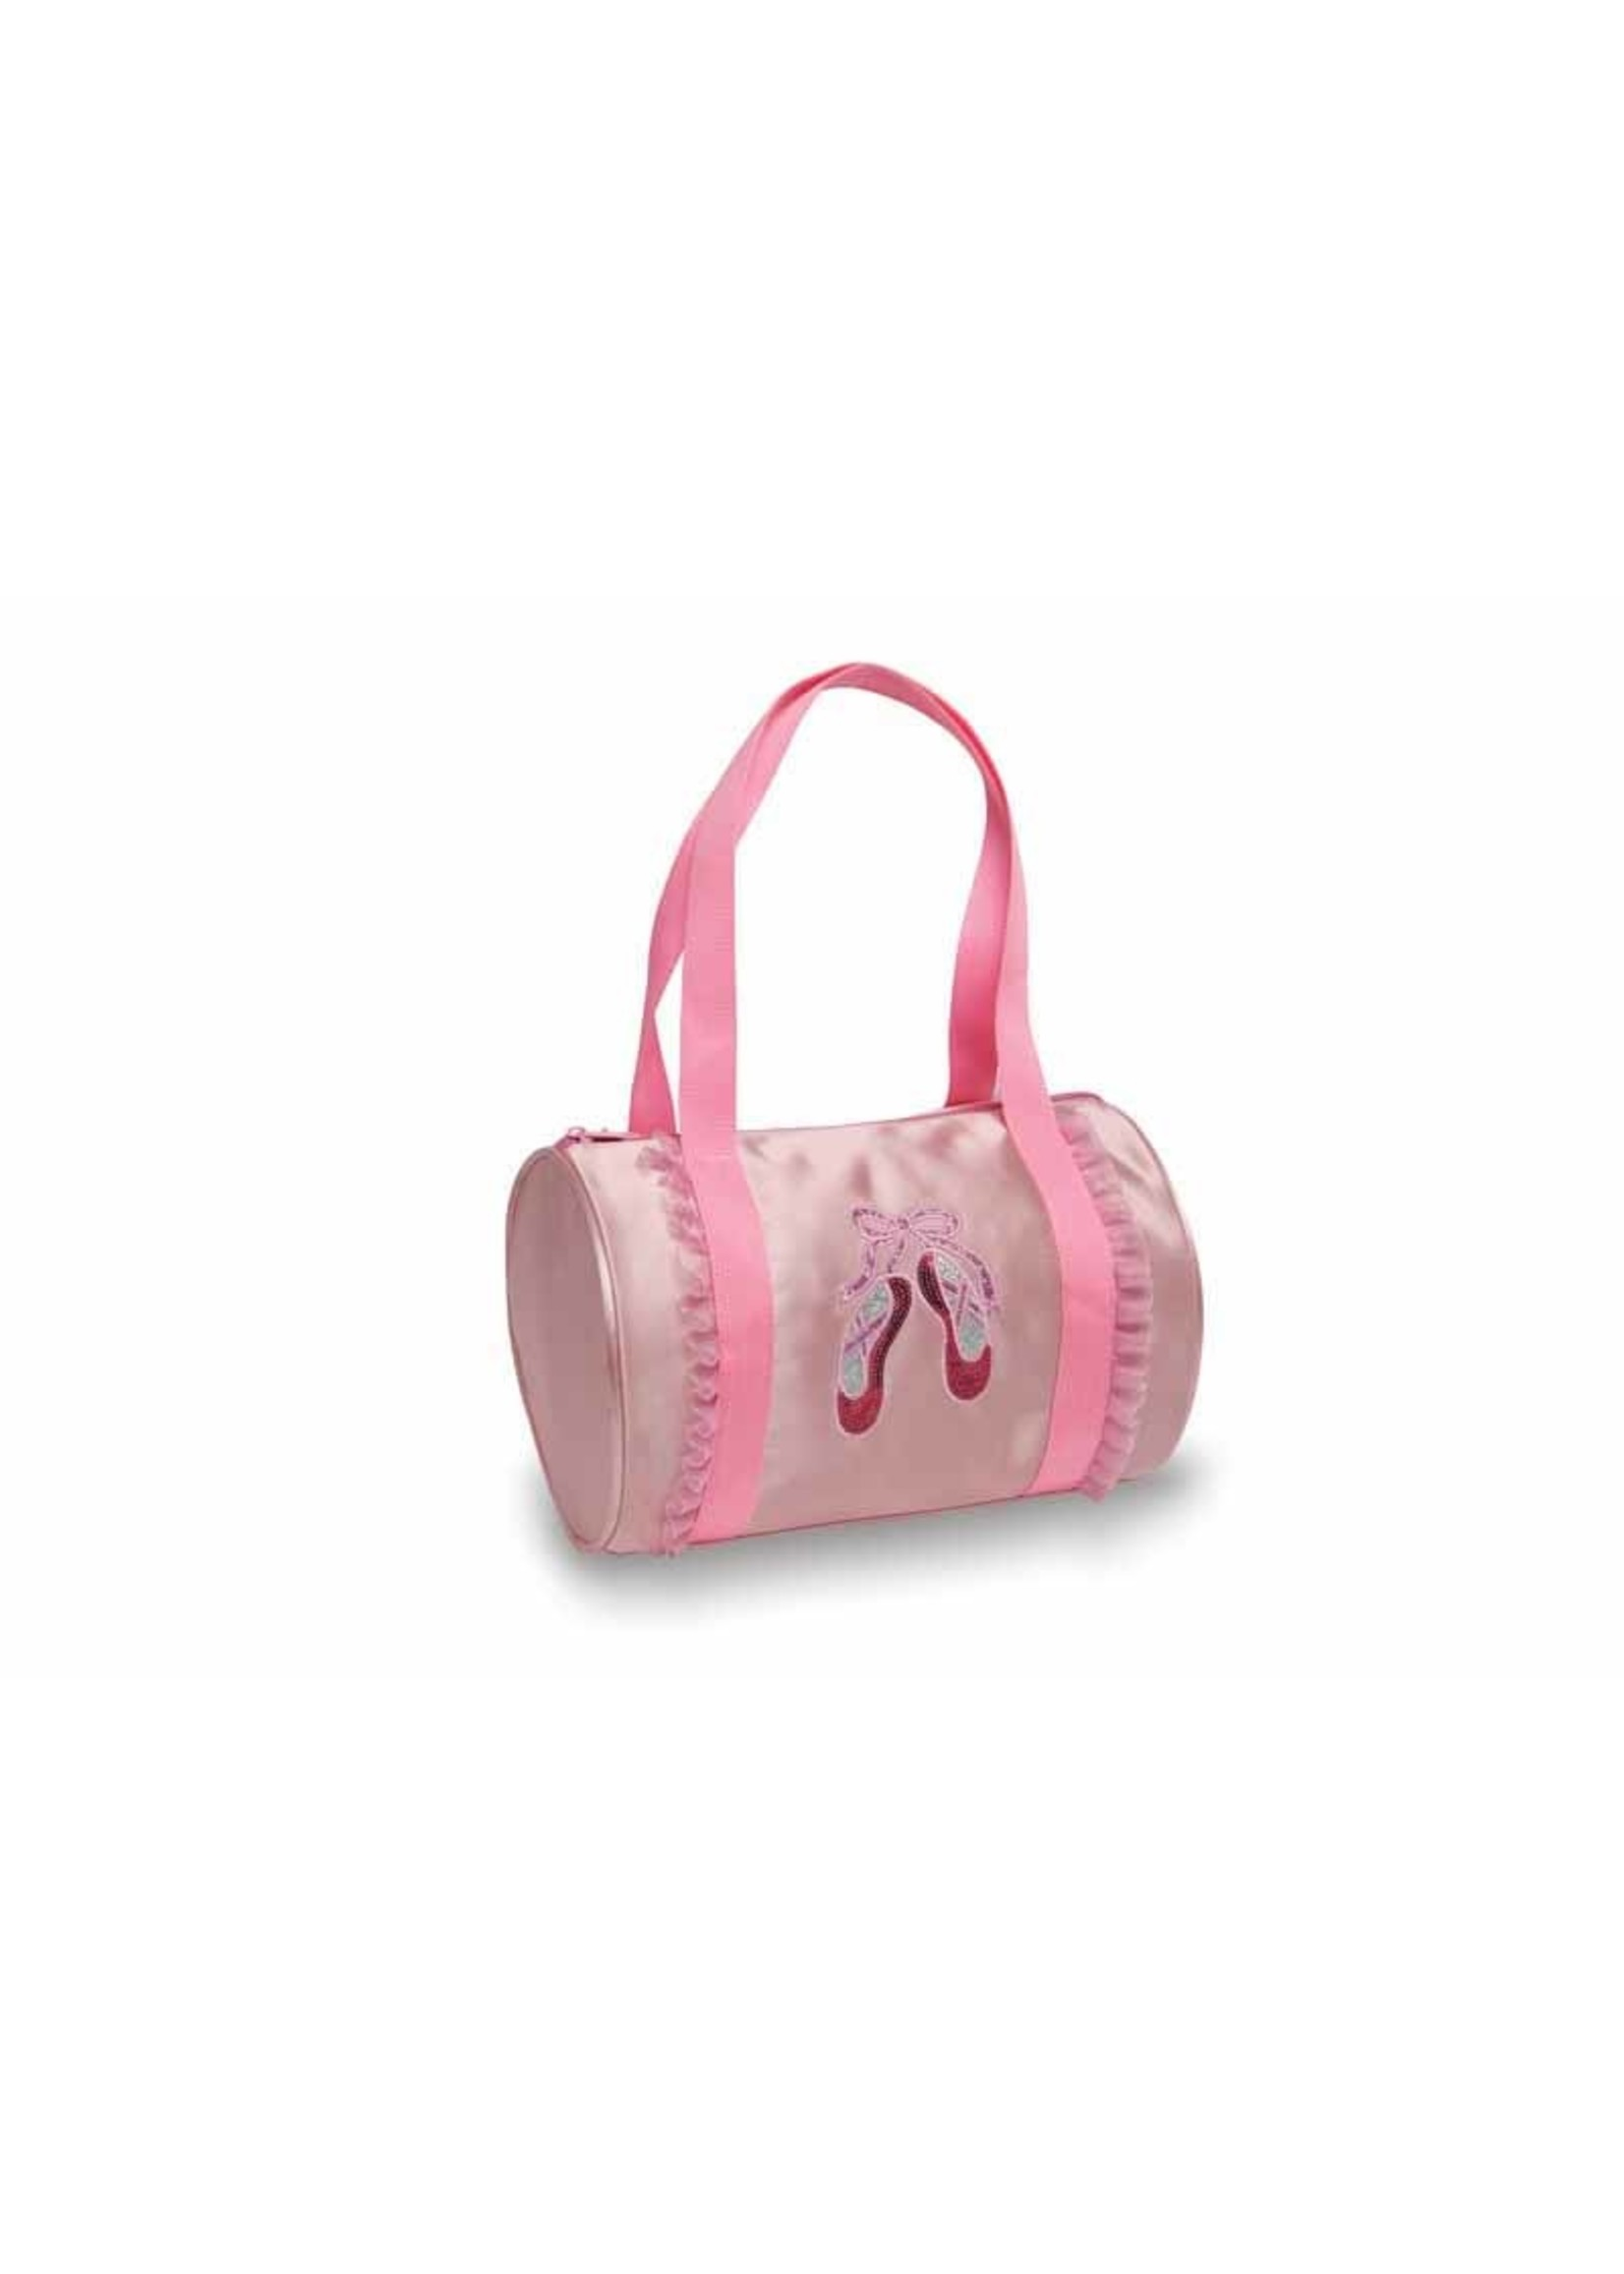 Danshuz Sac rose avec pointes brodées  « My Cute Ballet Bag » - Danshuz - B20533